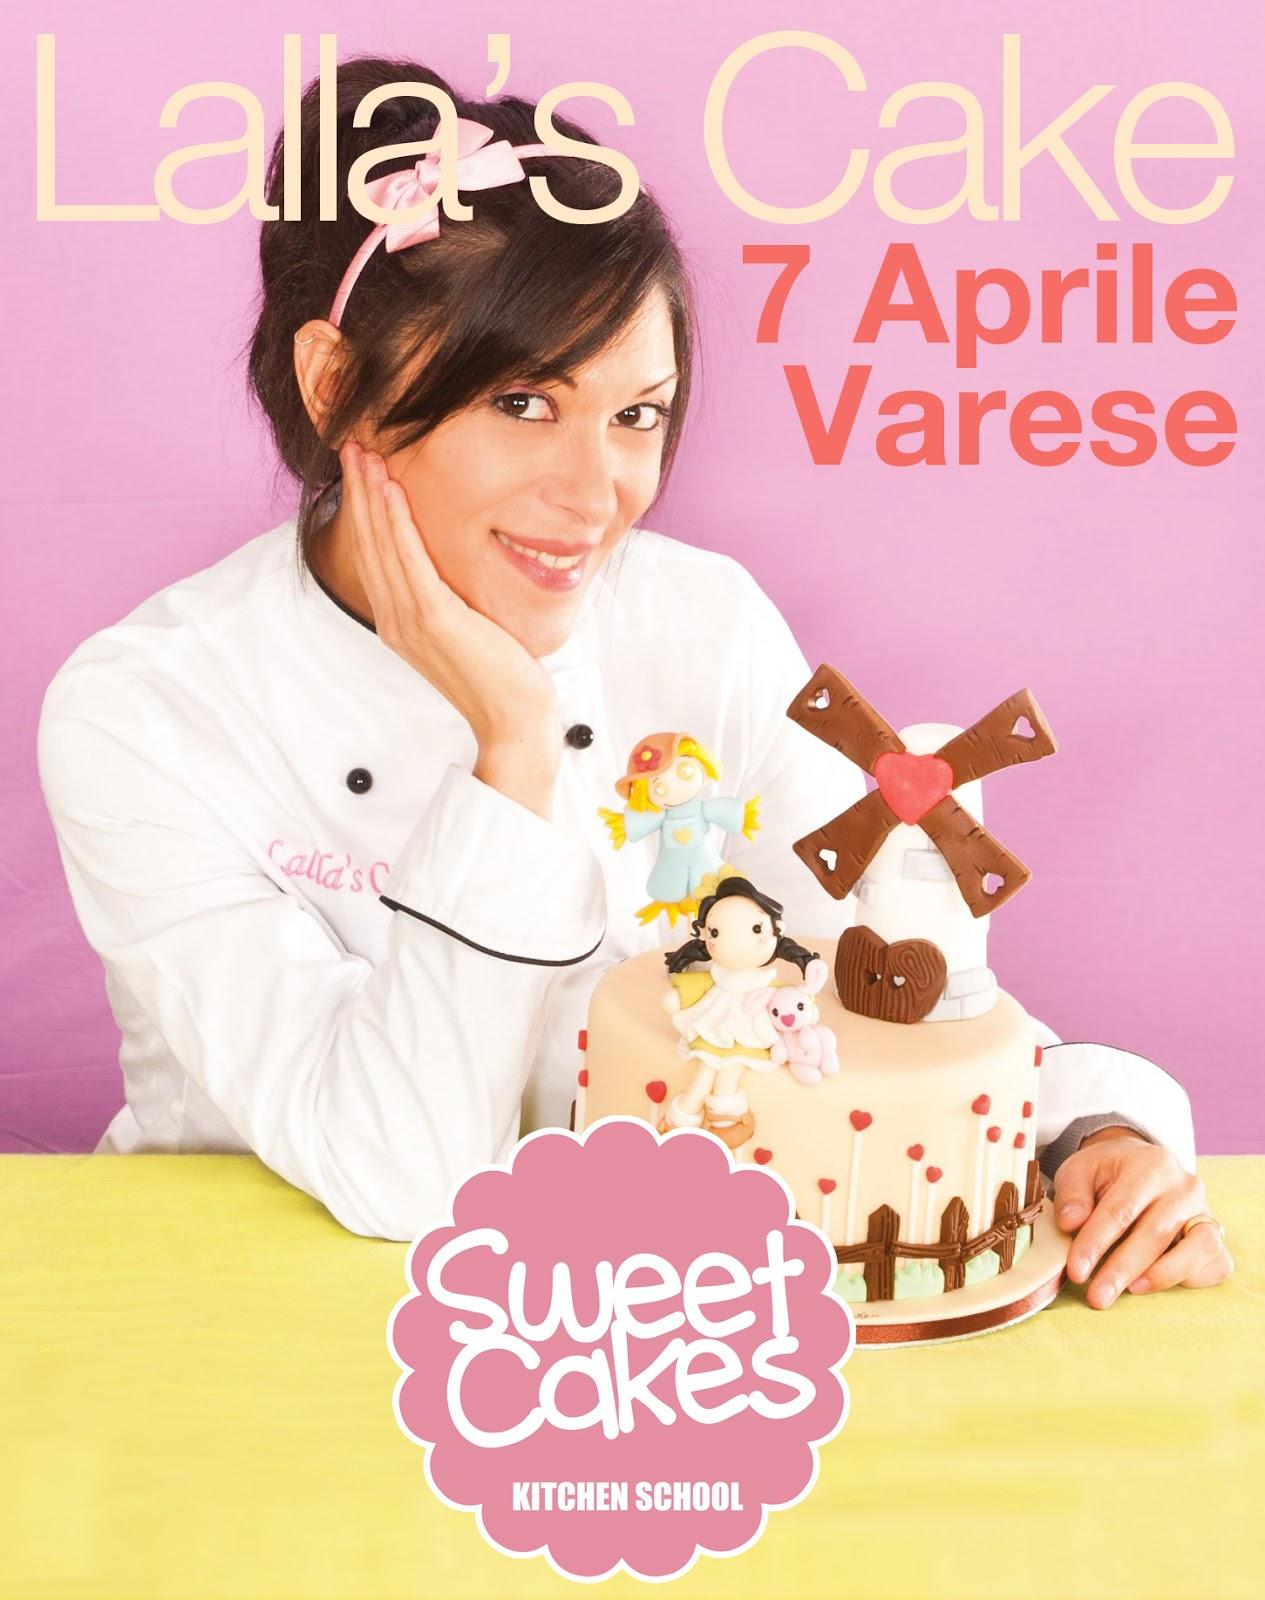 Cake Design Provincia Varese : Corso di cake design VARESE, 7 aprile 2013 - Sweet Cakes ...